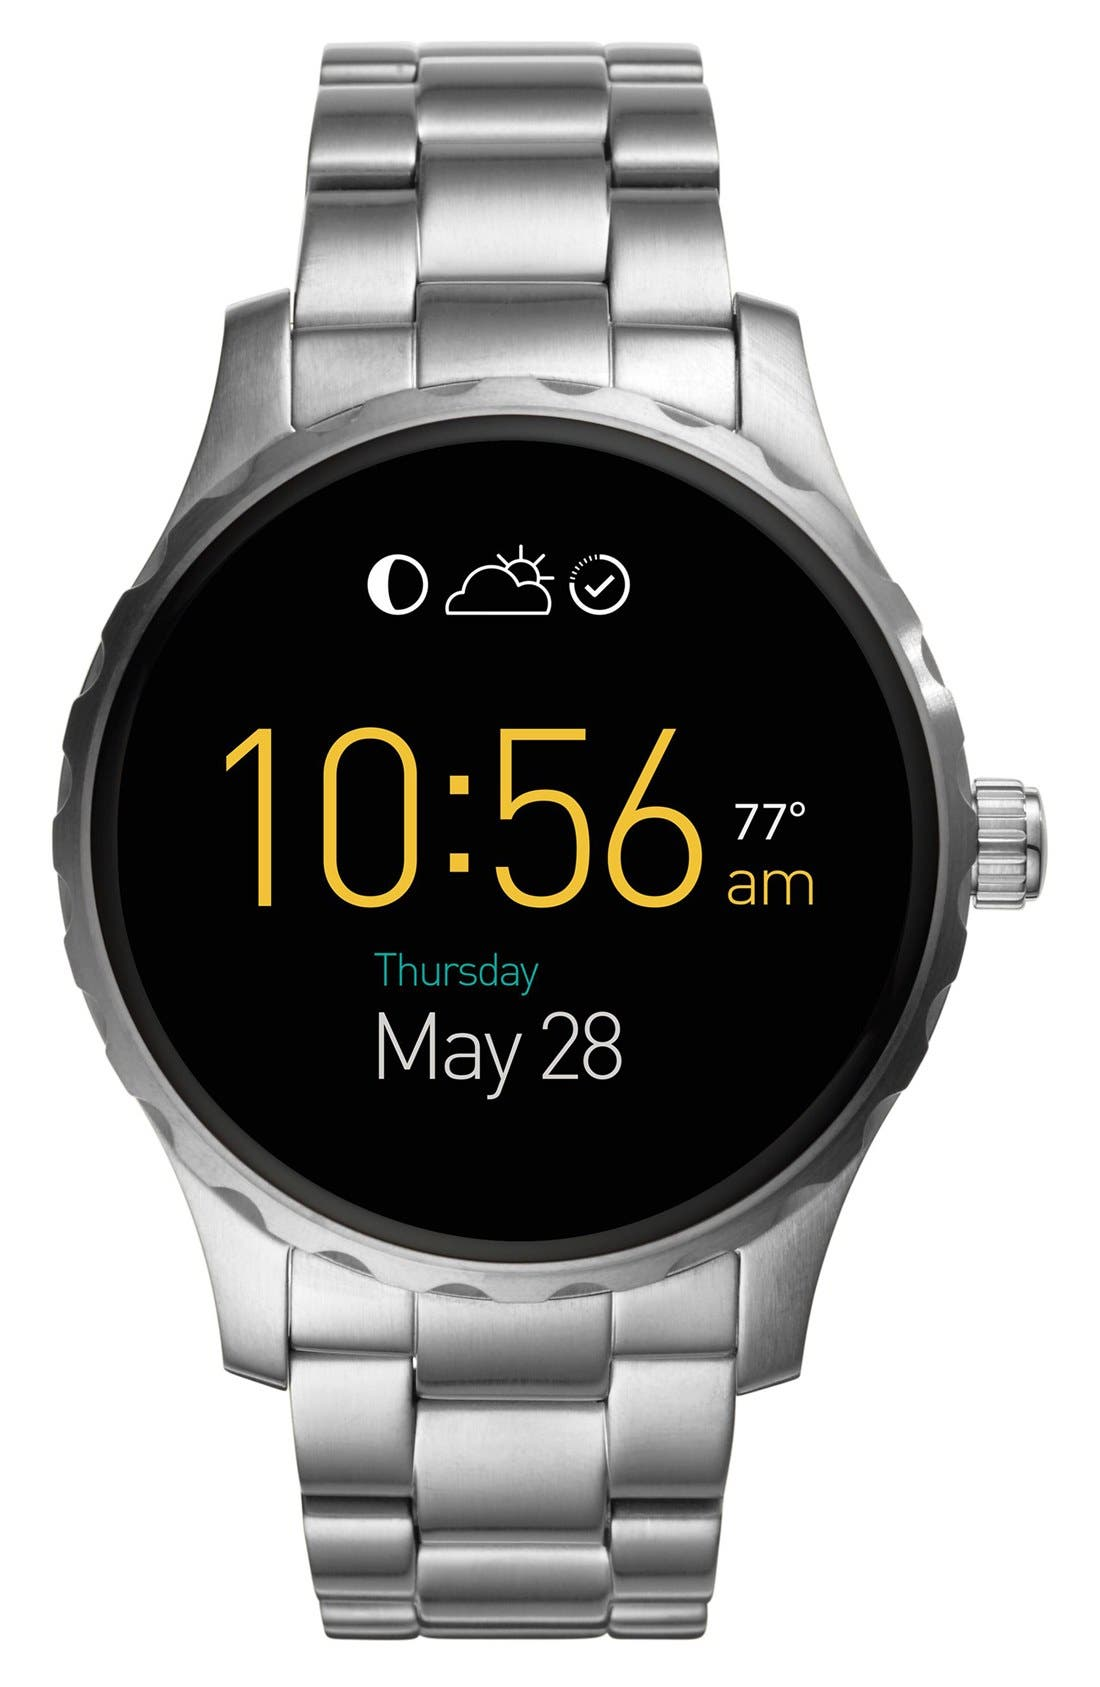 Fossil Q Marshal Digital Smart Bracelet Watch, 45mm